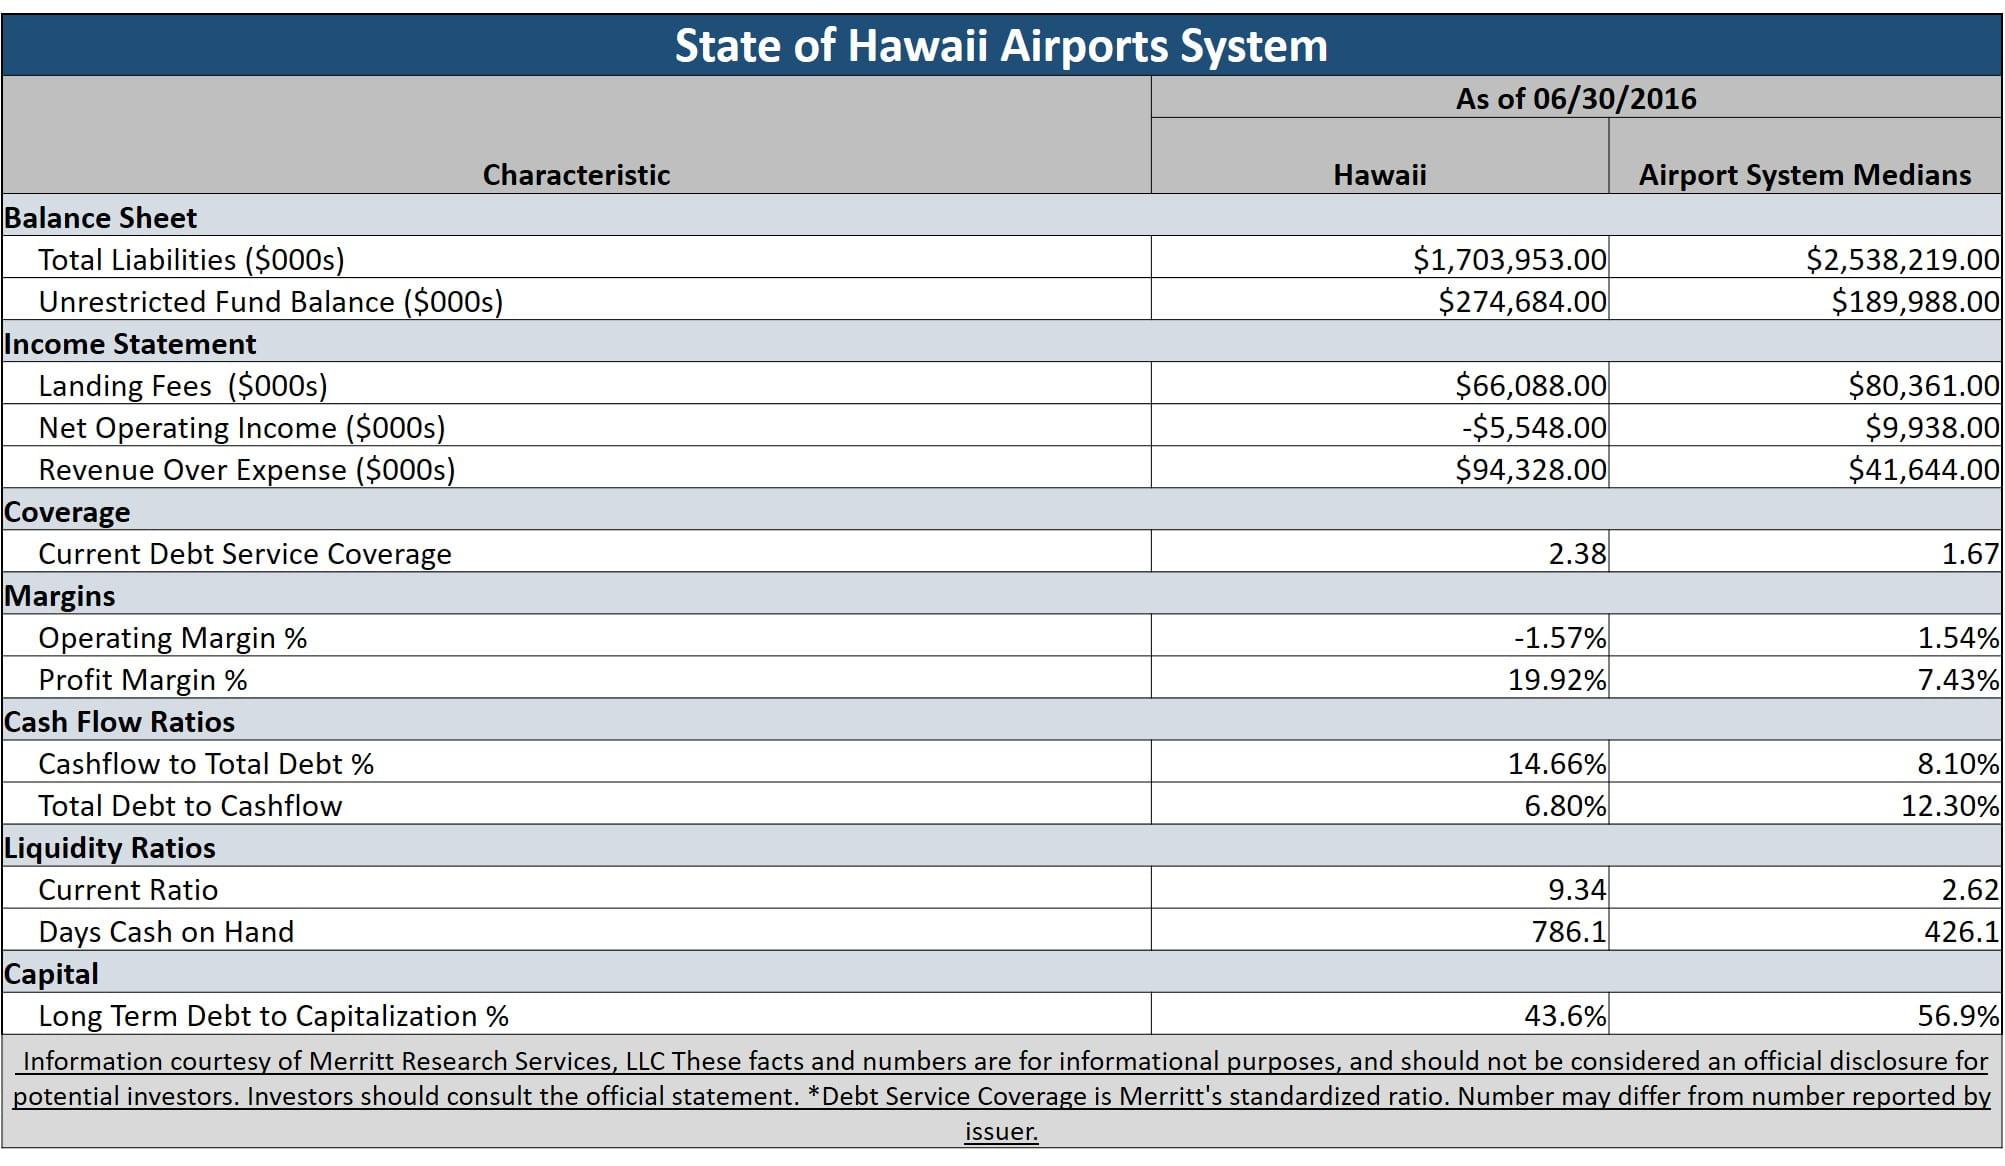 Municipal Bond Featured Snapshot - Hawaii Airports System